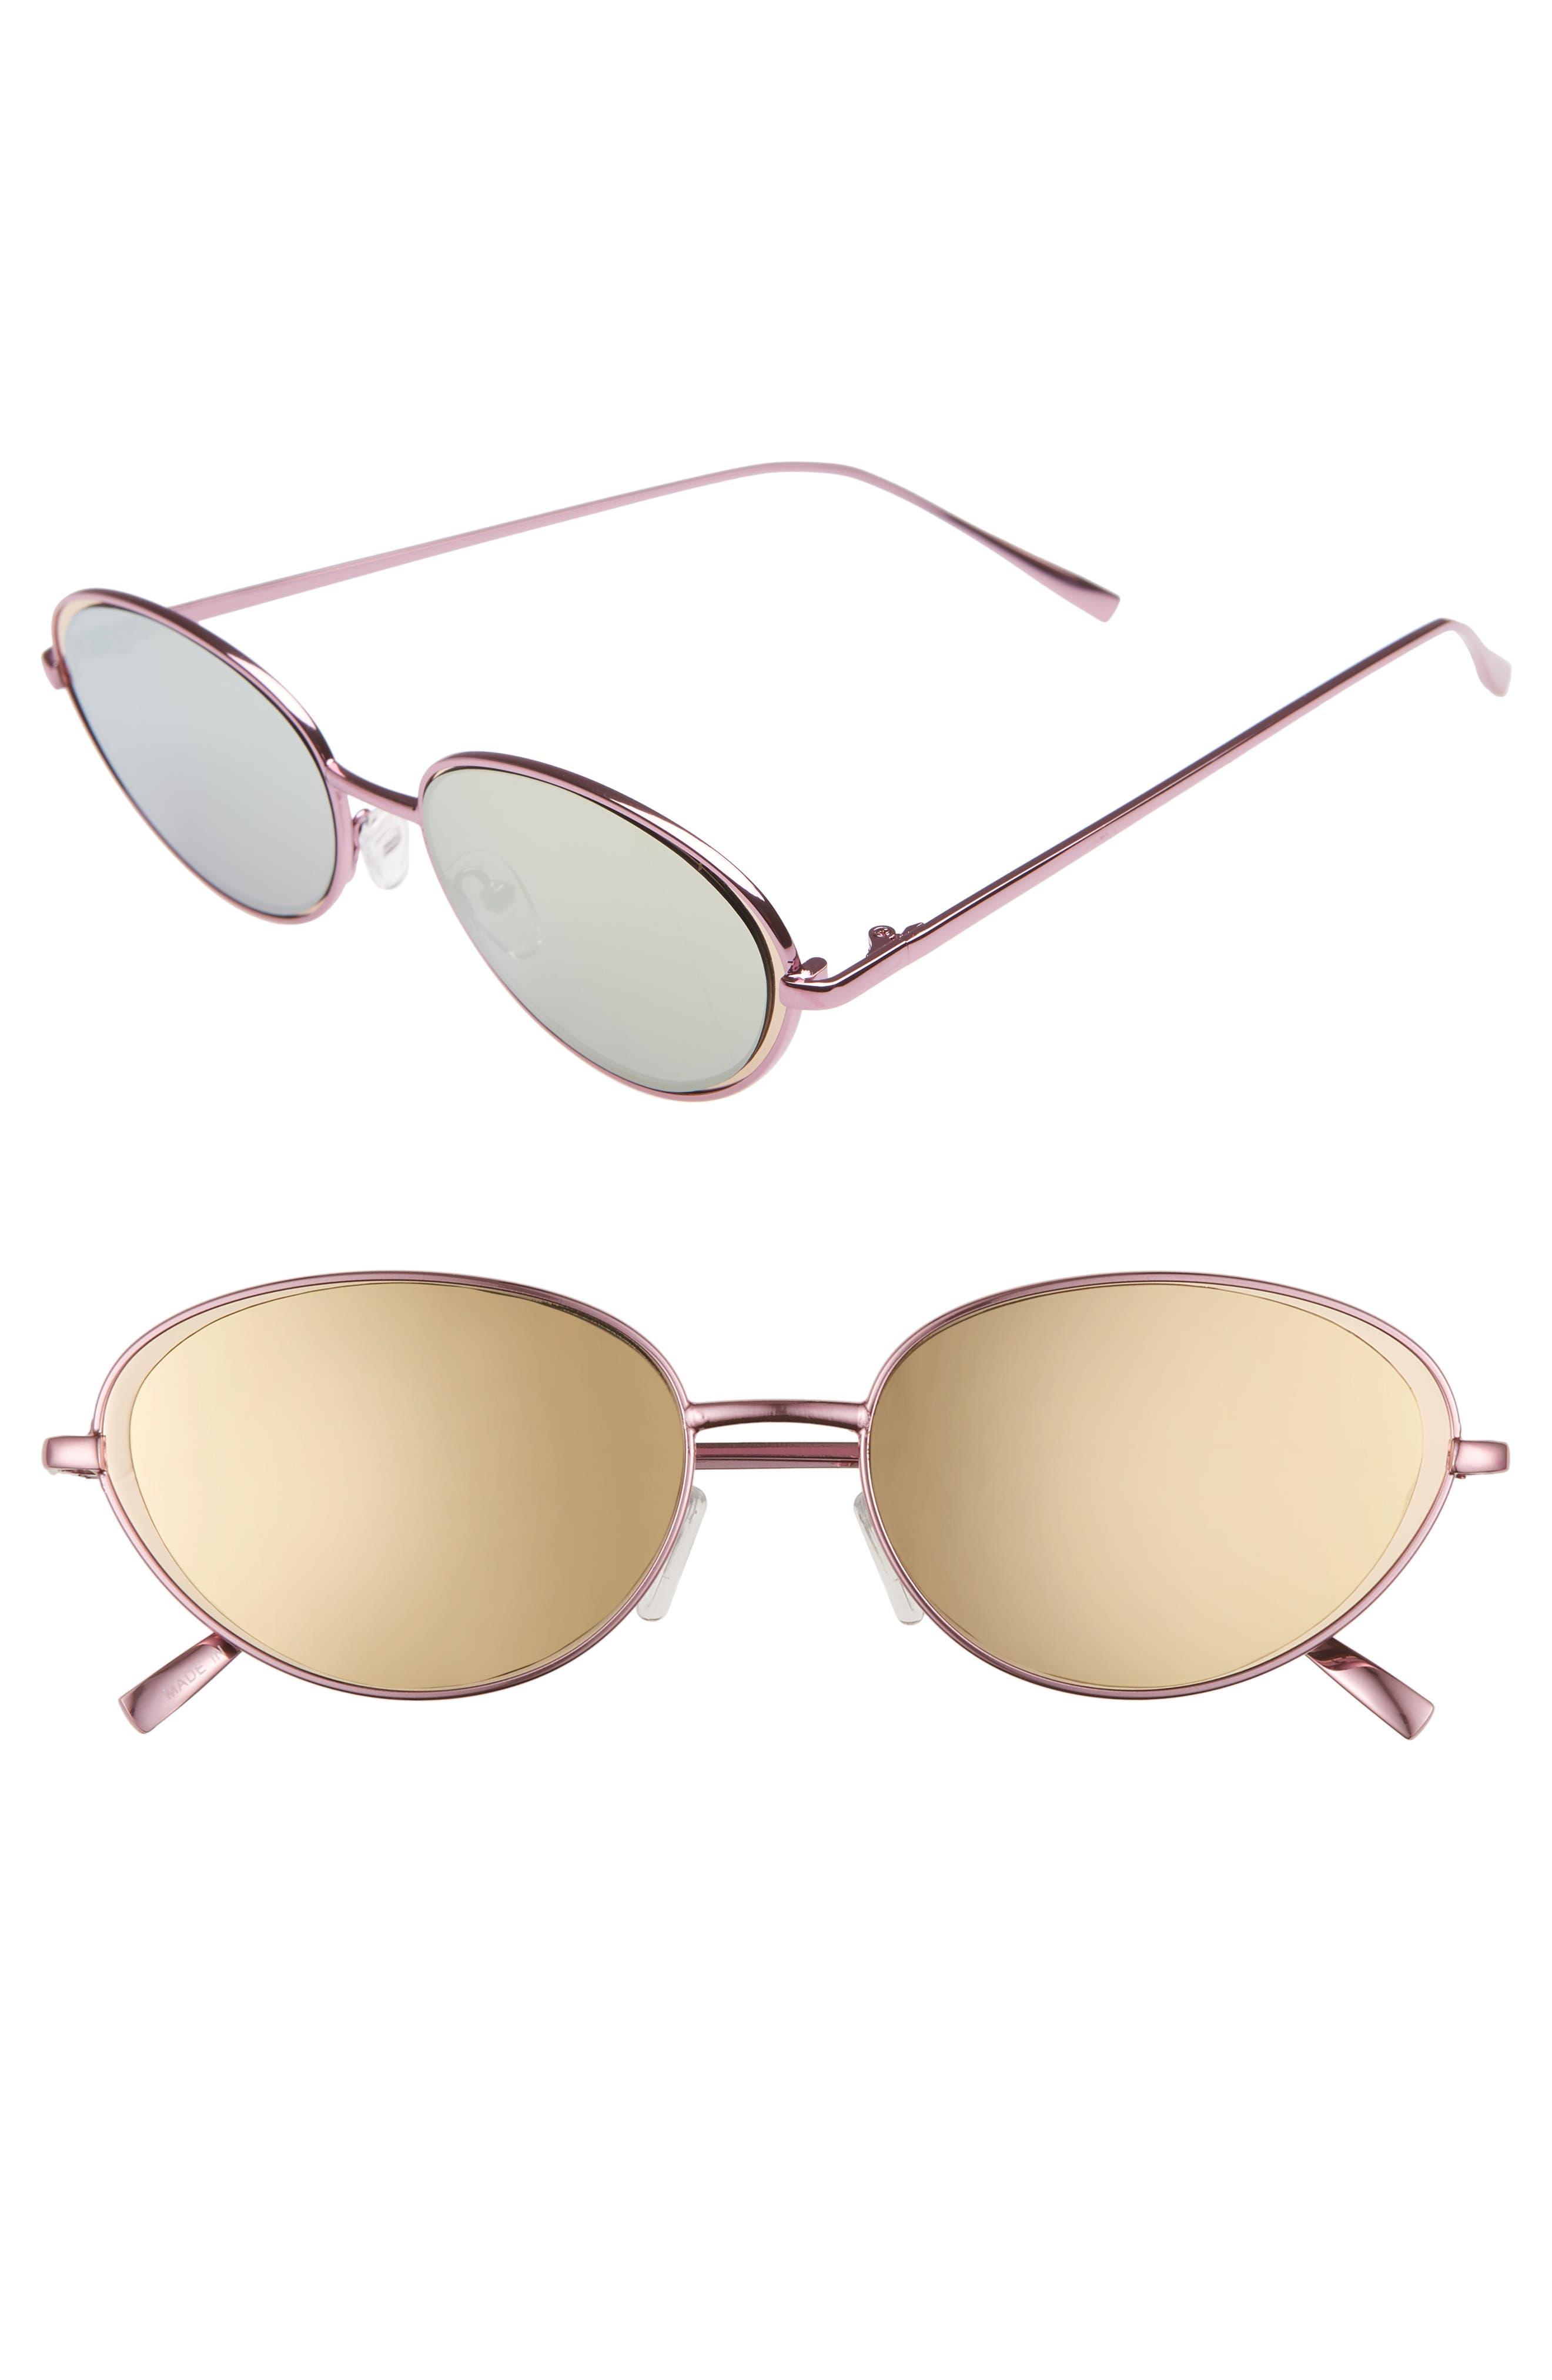 57mm Oval Sunglasses,                         Main,                         color, 650